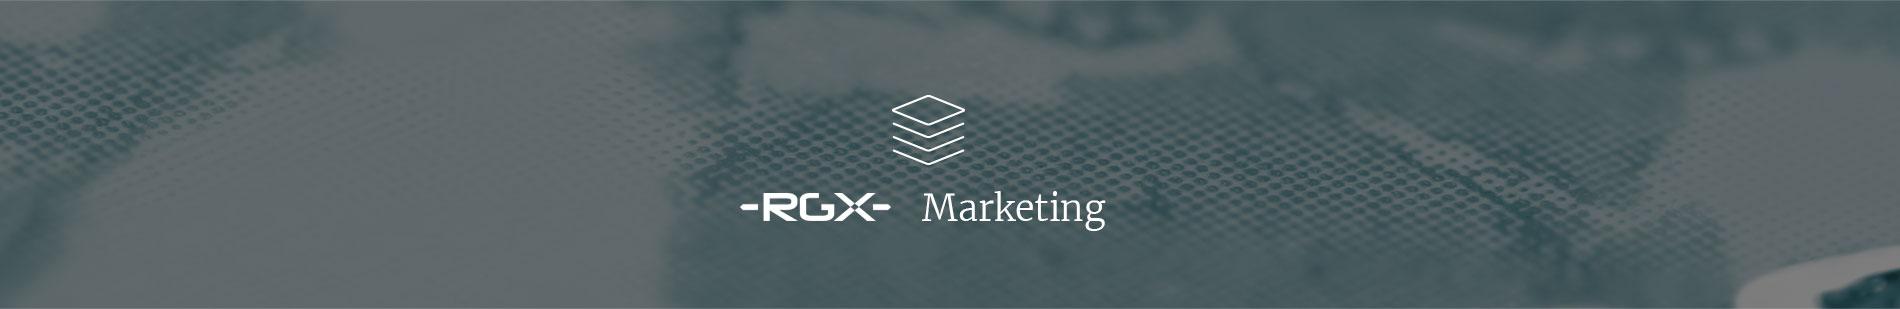 RGX Marketing